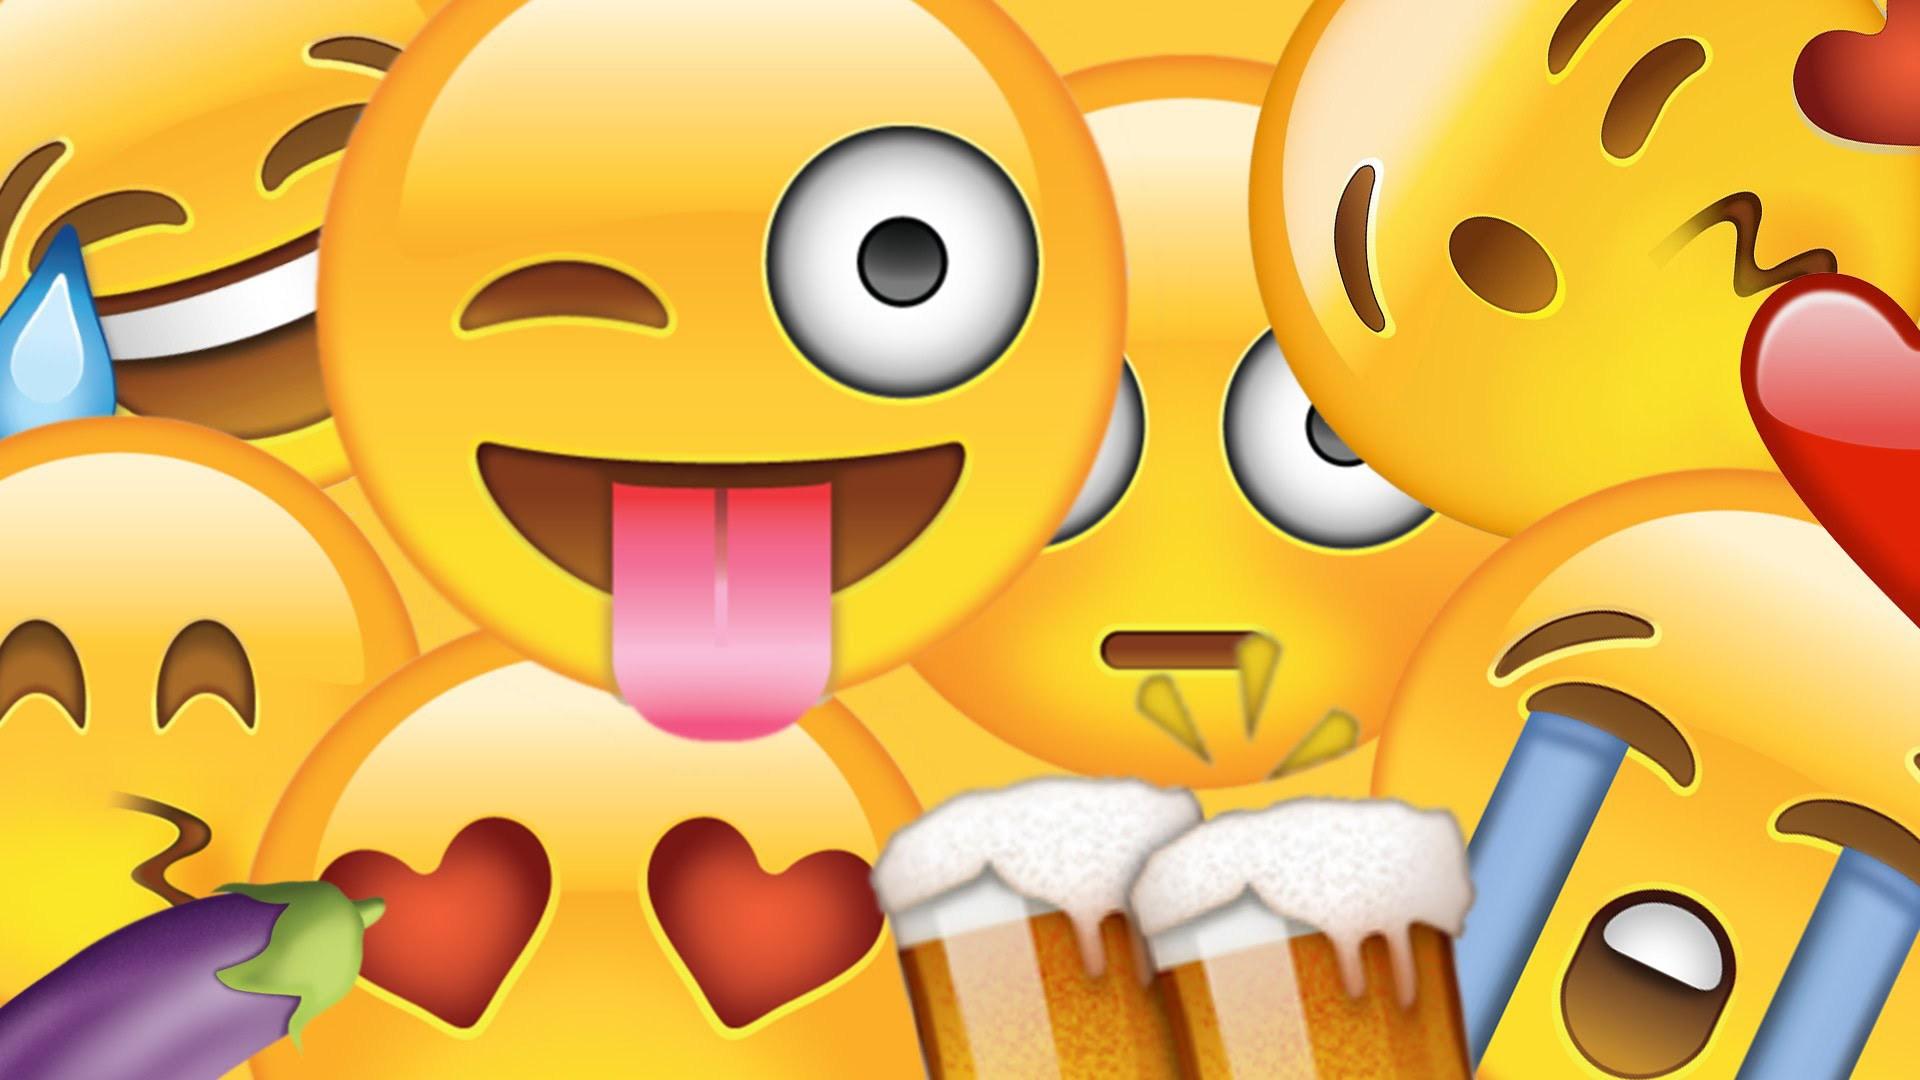 emoji wallpaper background full paper - photo #7